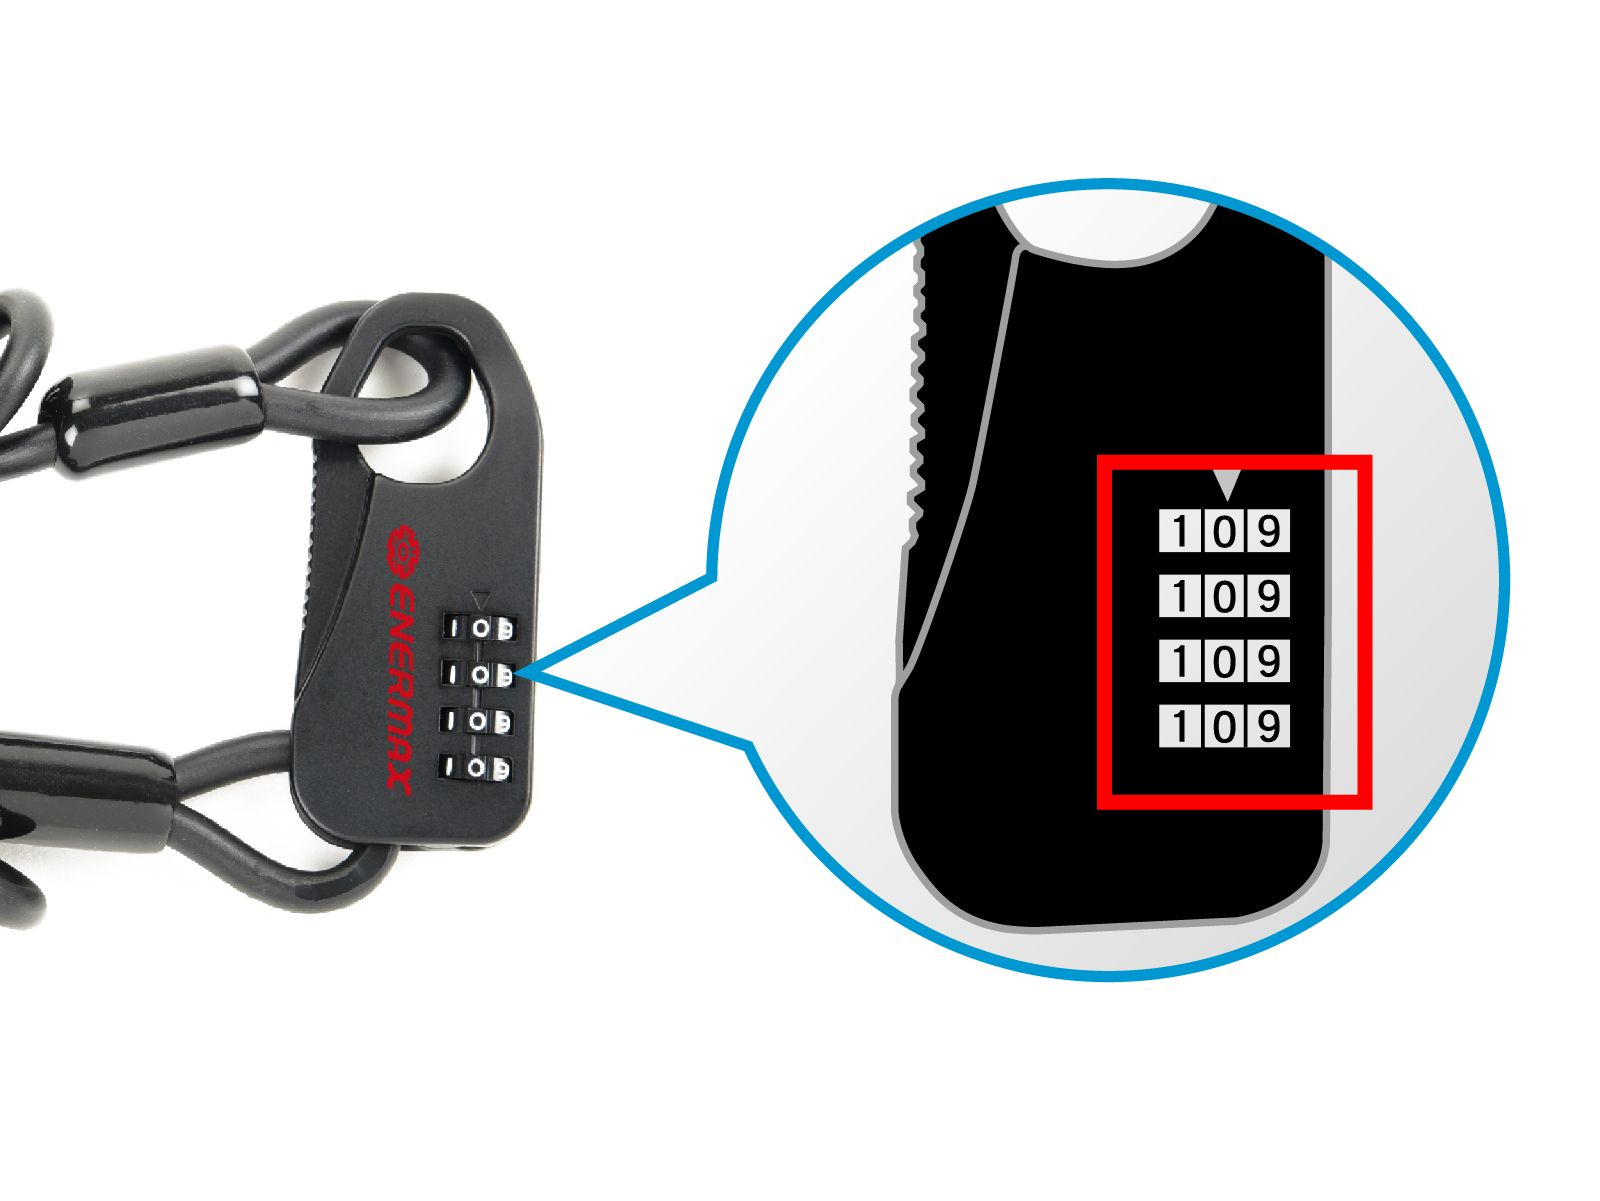 ENERMAX 自行車密碼鎖